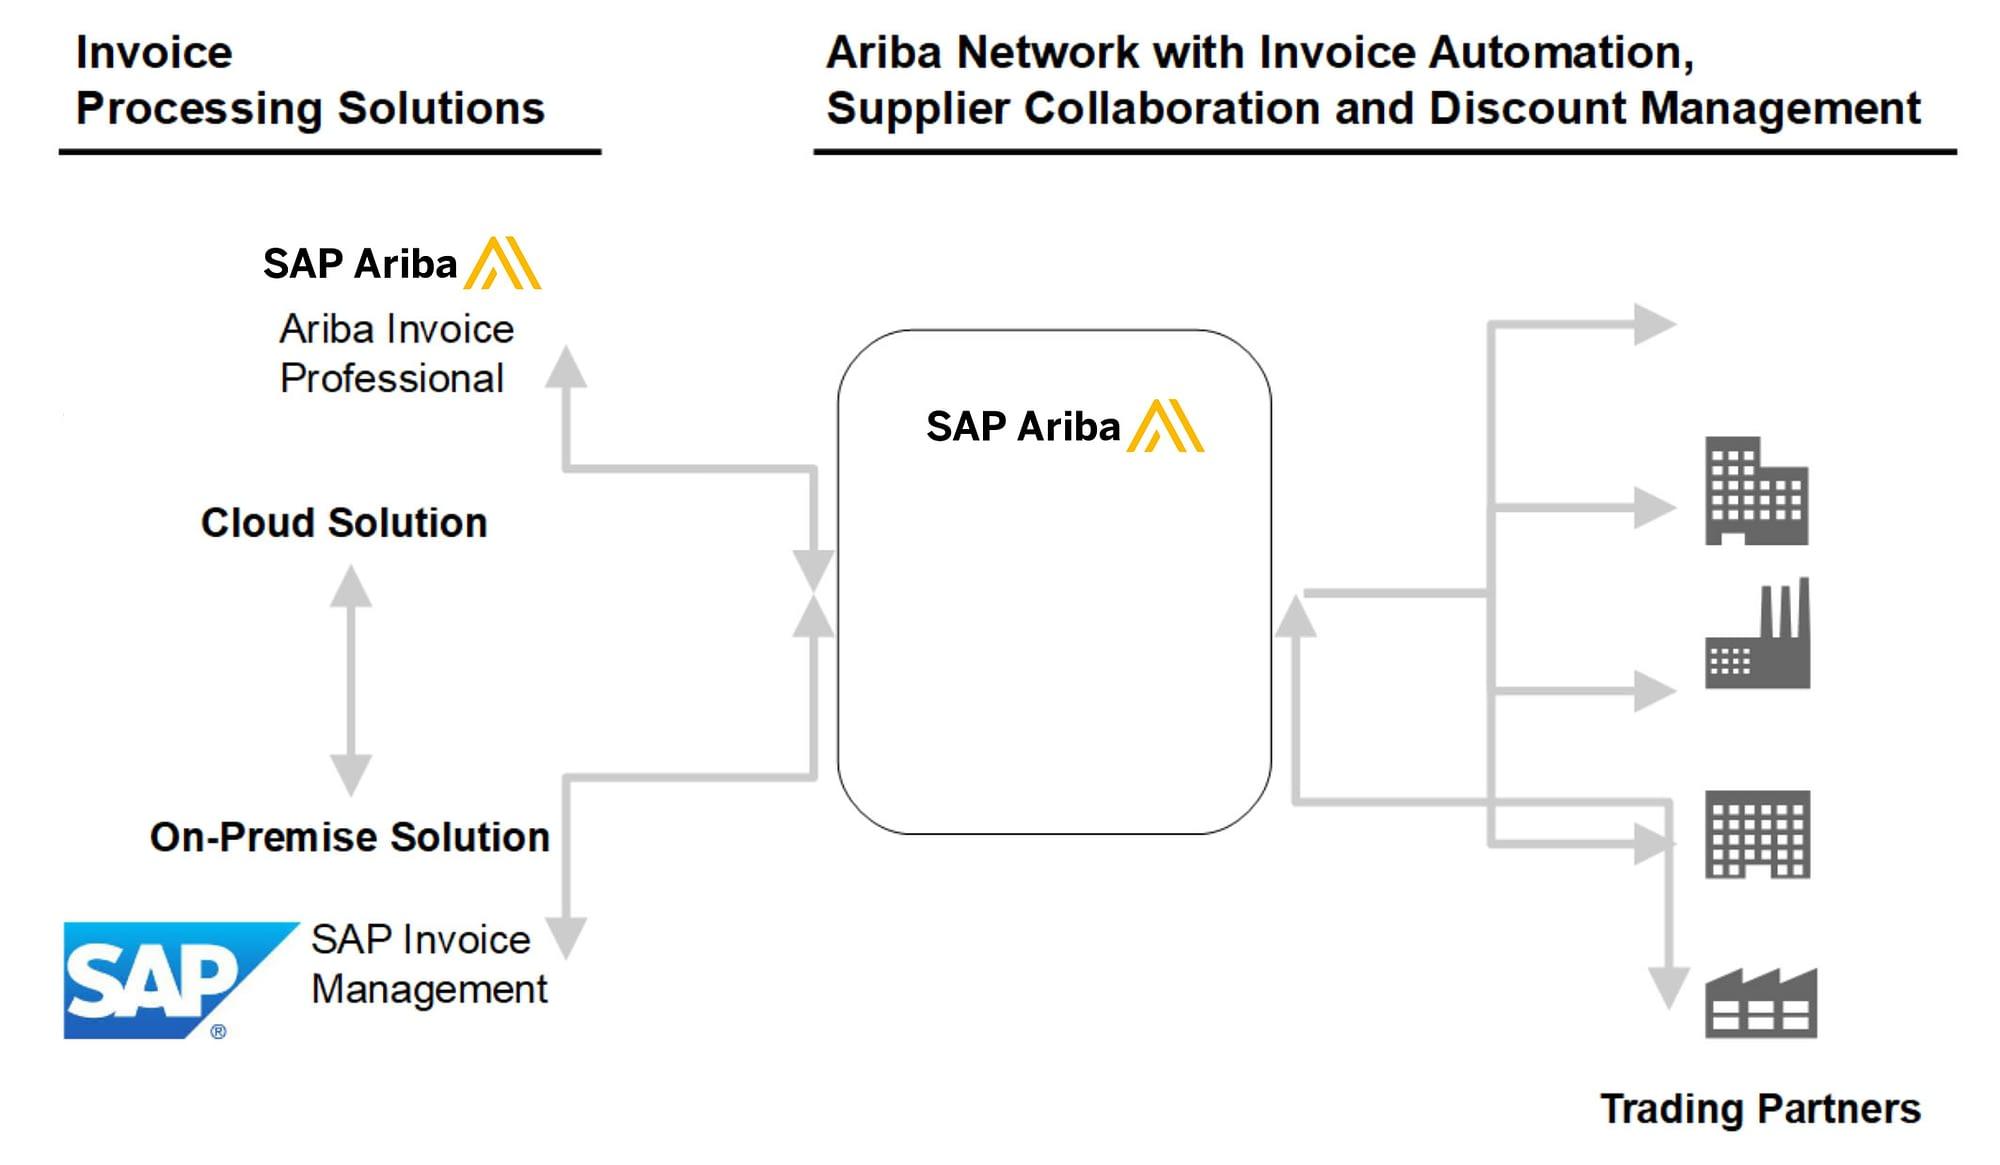 sap-ariba-invoice-automation-process